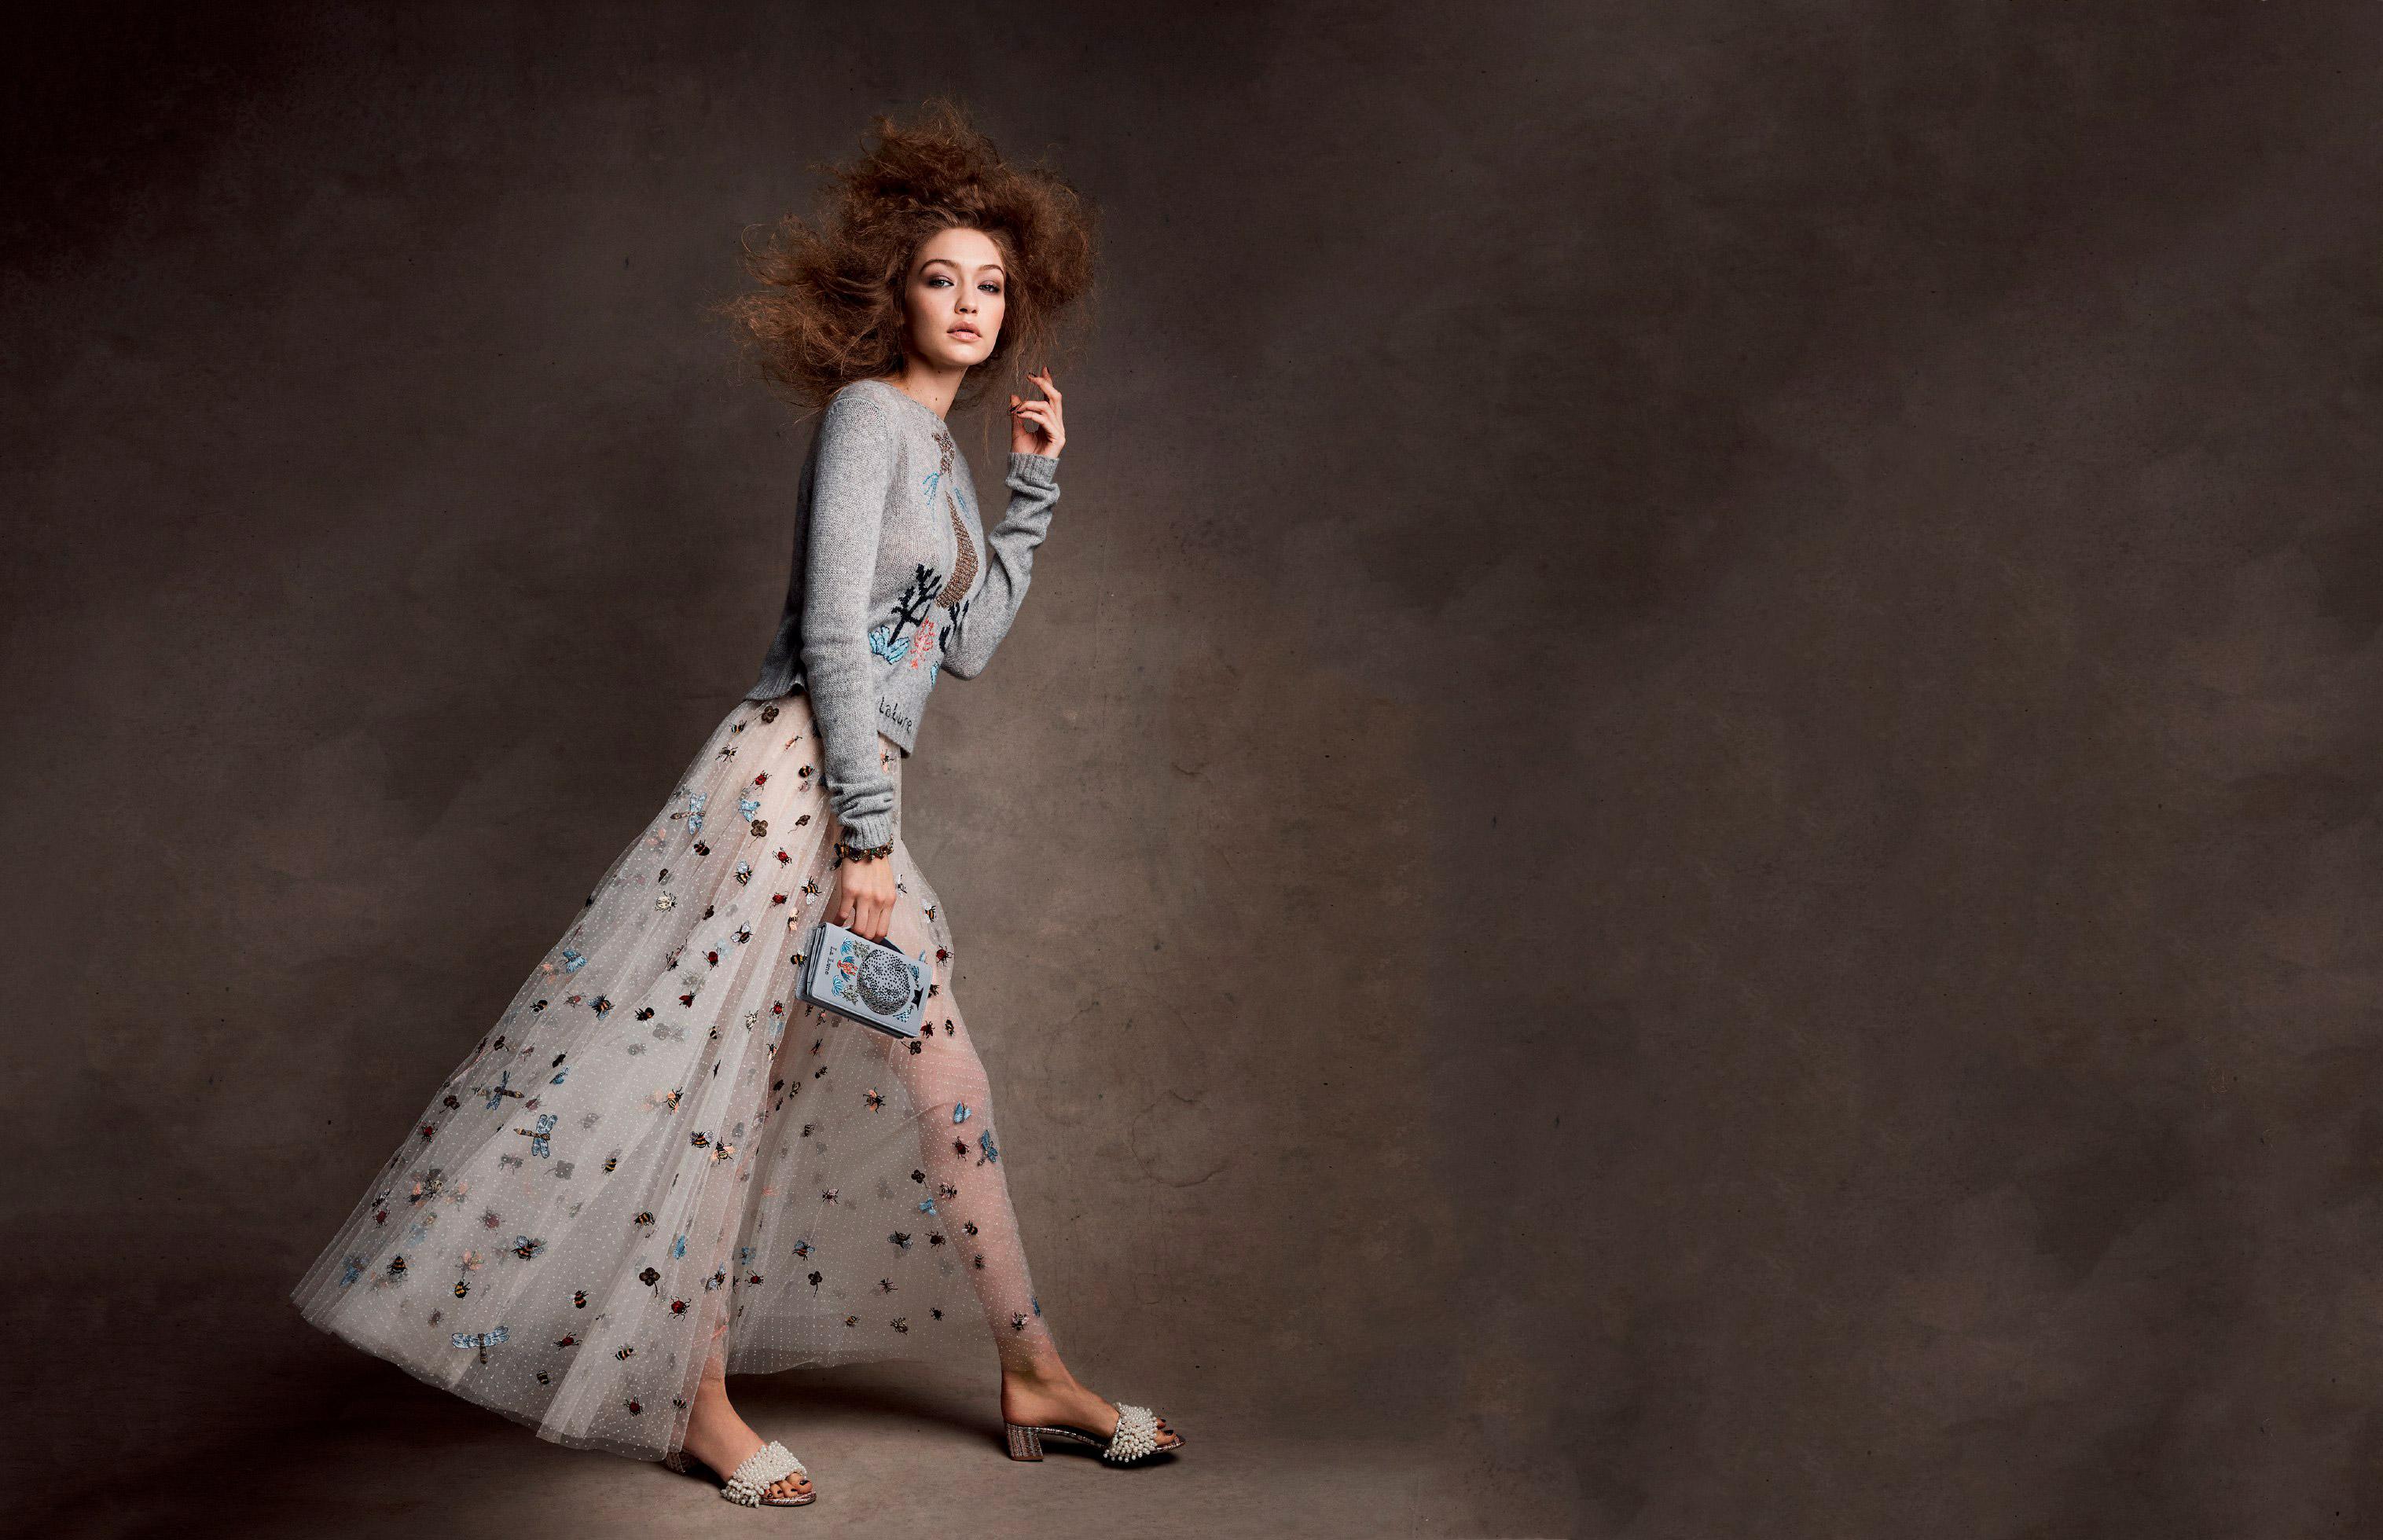 Gigi Hadid Vogue US 2017, HD Celebrities, 4k Wallpapers